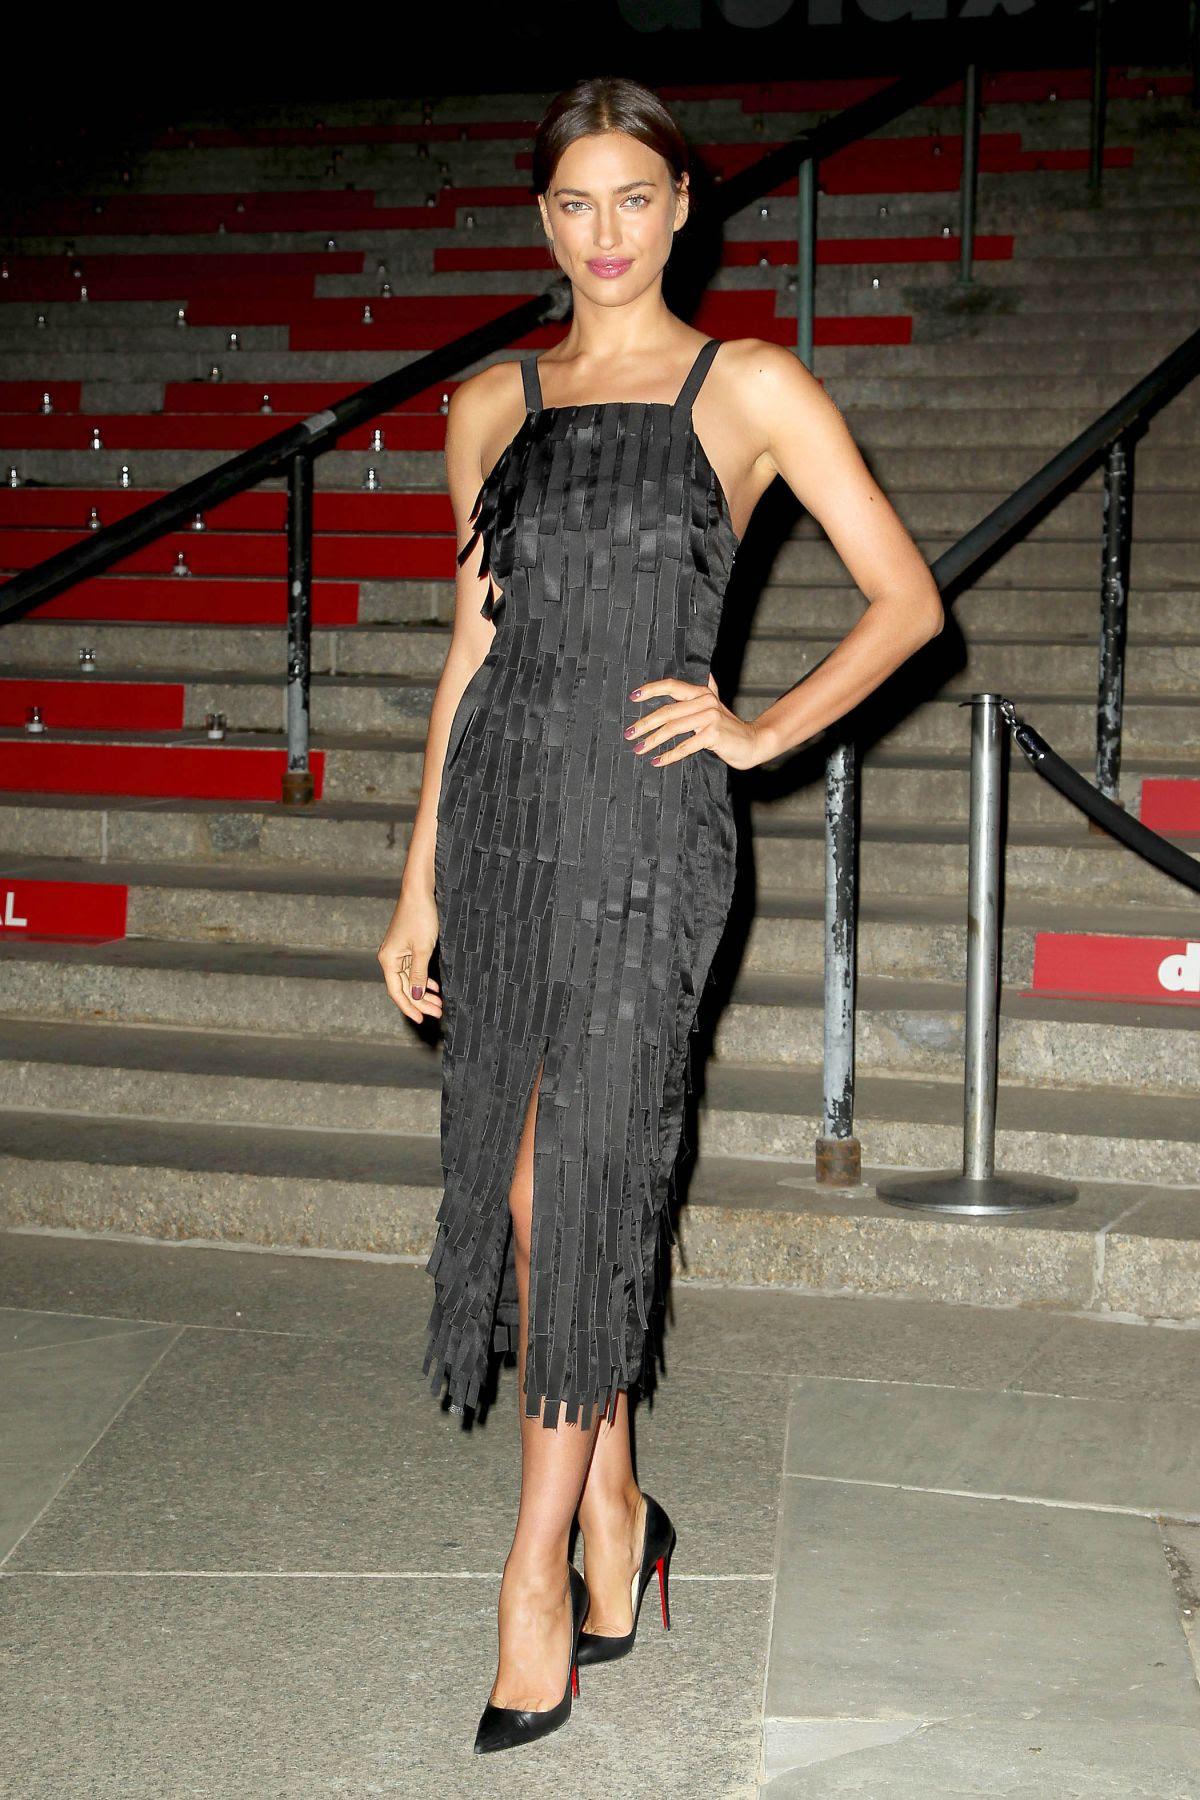 IRINA SHAYK at 2015 Vanity Fair Party in New York